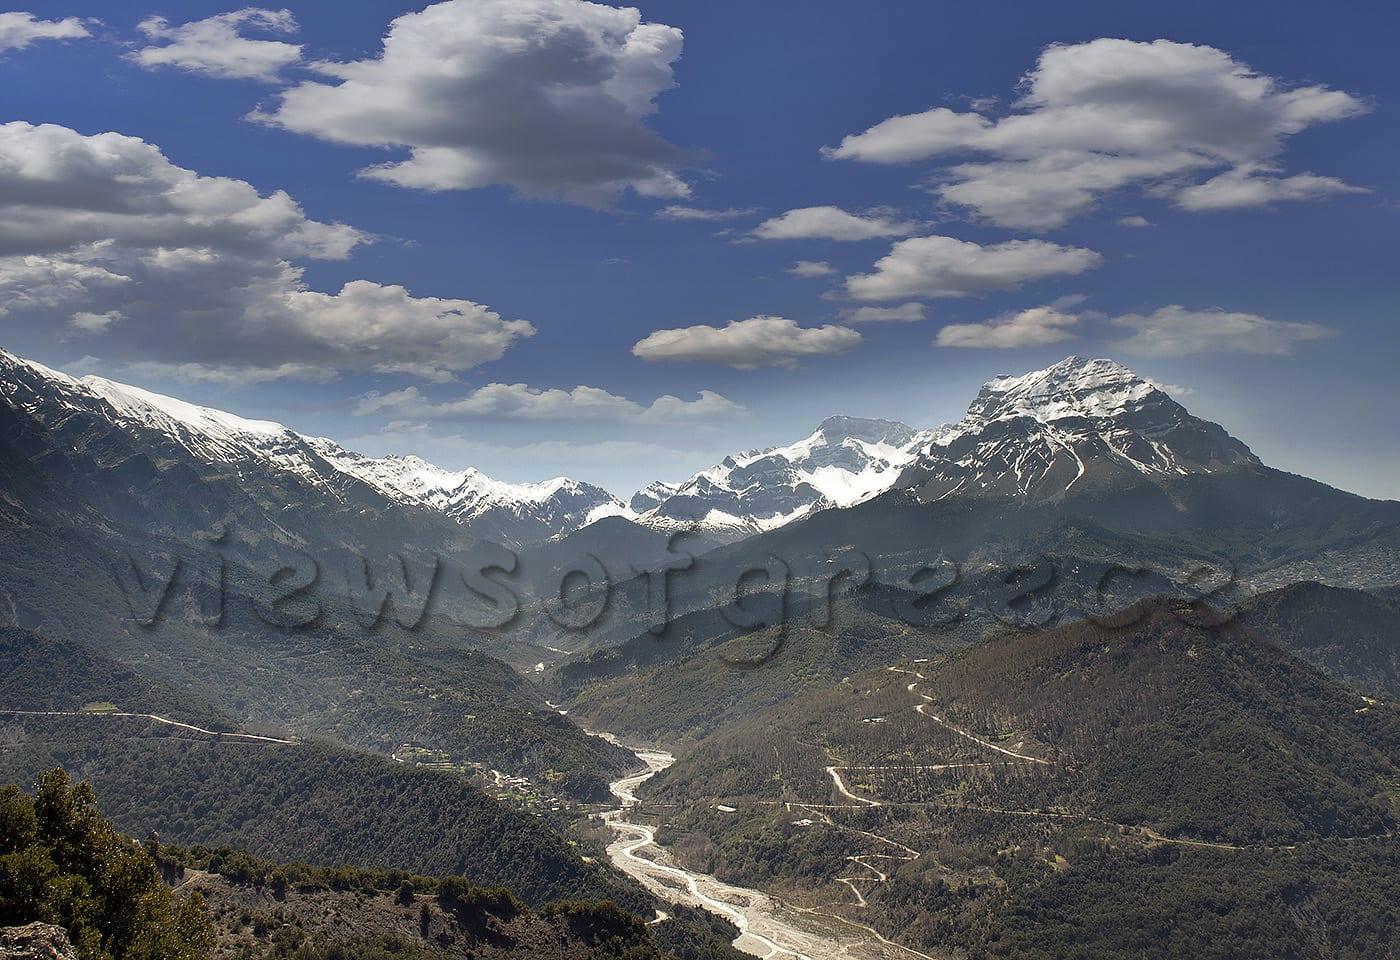 tzoumerka, travel, greece, mountain, nature, rock, river, hiking,  Epirus, Τζουμέρκα, Πράμαντα, Μελισσουργοί,  Συρράκο, Καλαρρύτες, μονή Κηπίνας, Άραχθος, γεφύρι Πλάκας, Καταρράκτης, φαράγγι, Ματσούκι,